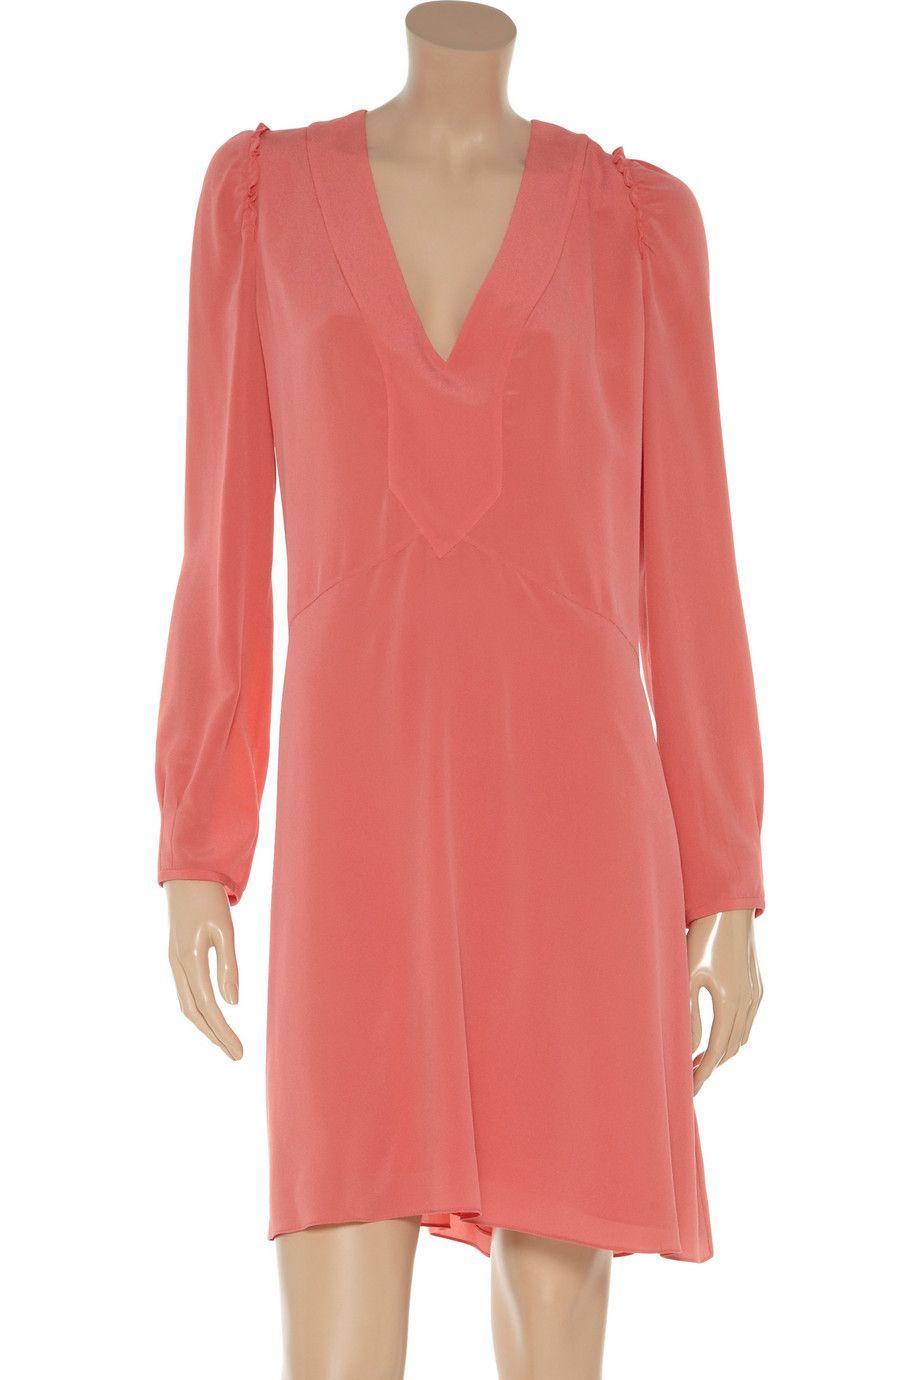 Silk crepe de chine dress by Vanessa Bruno